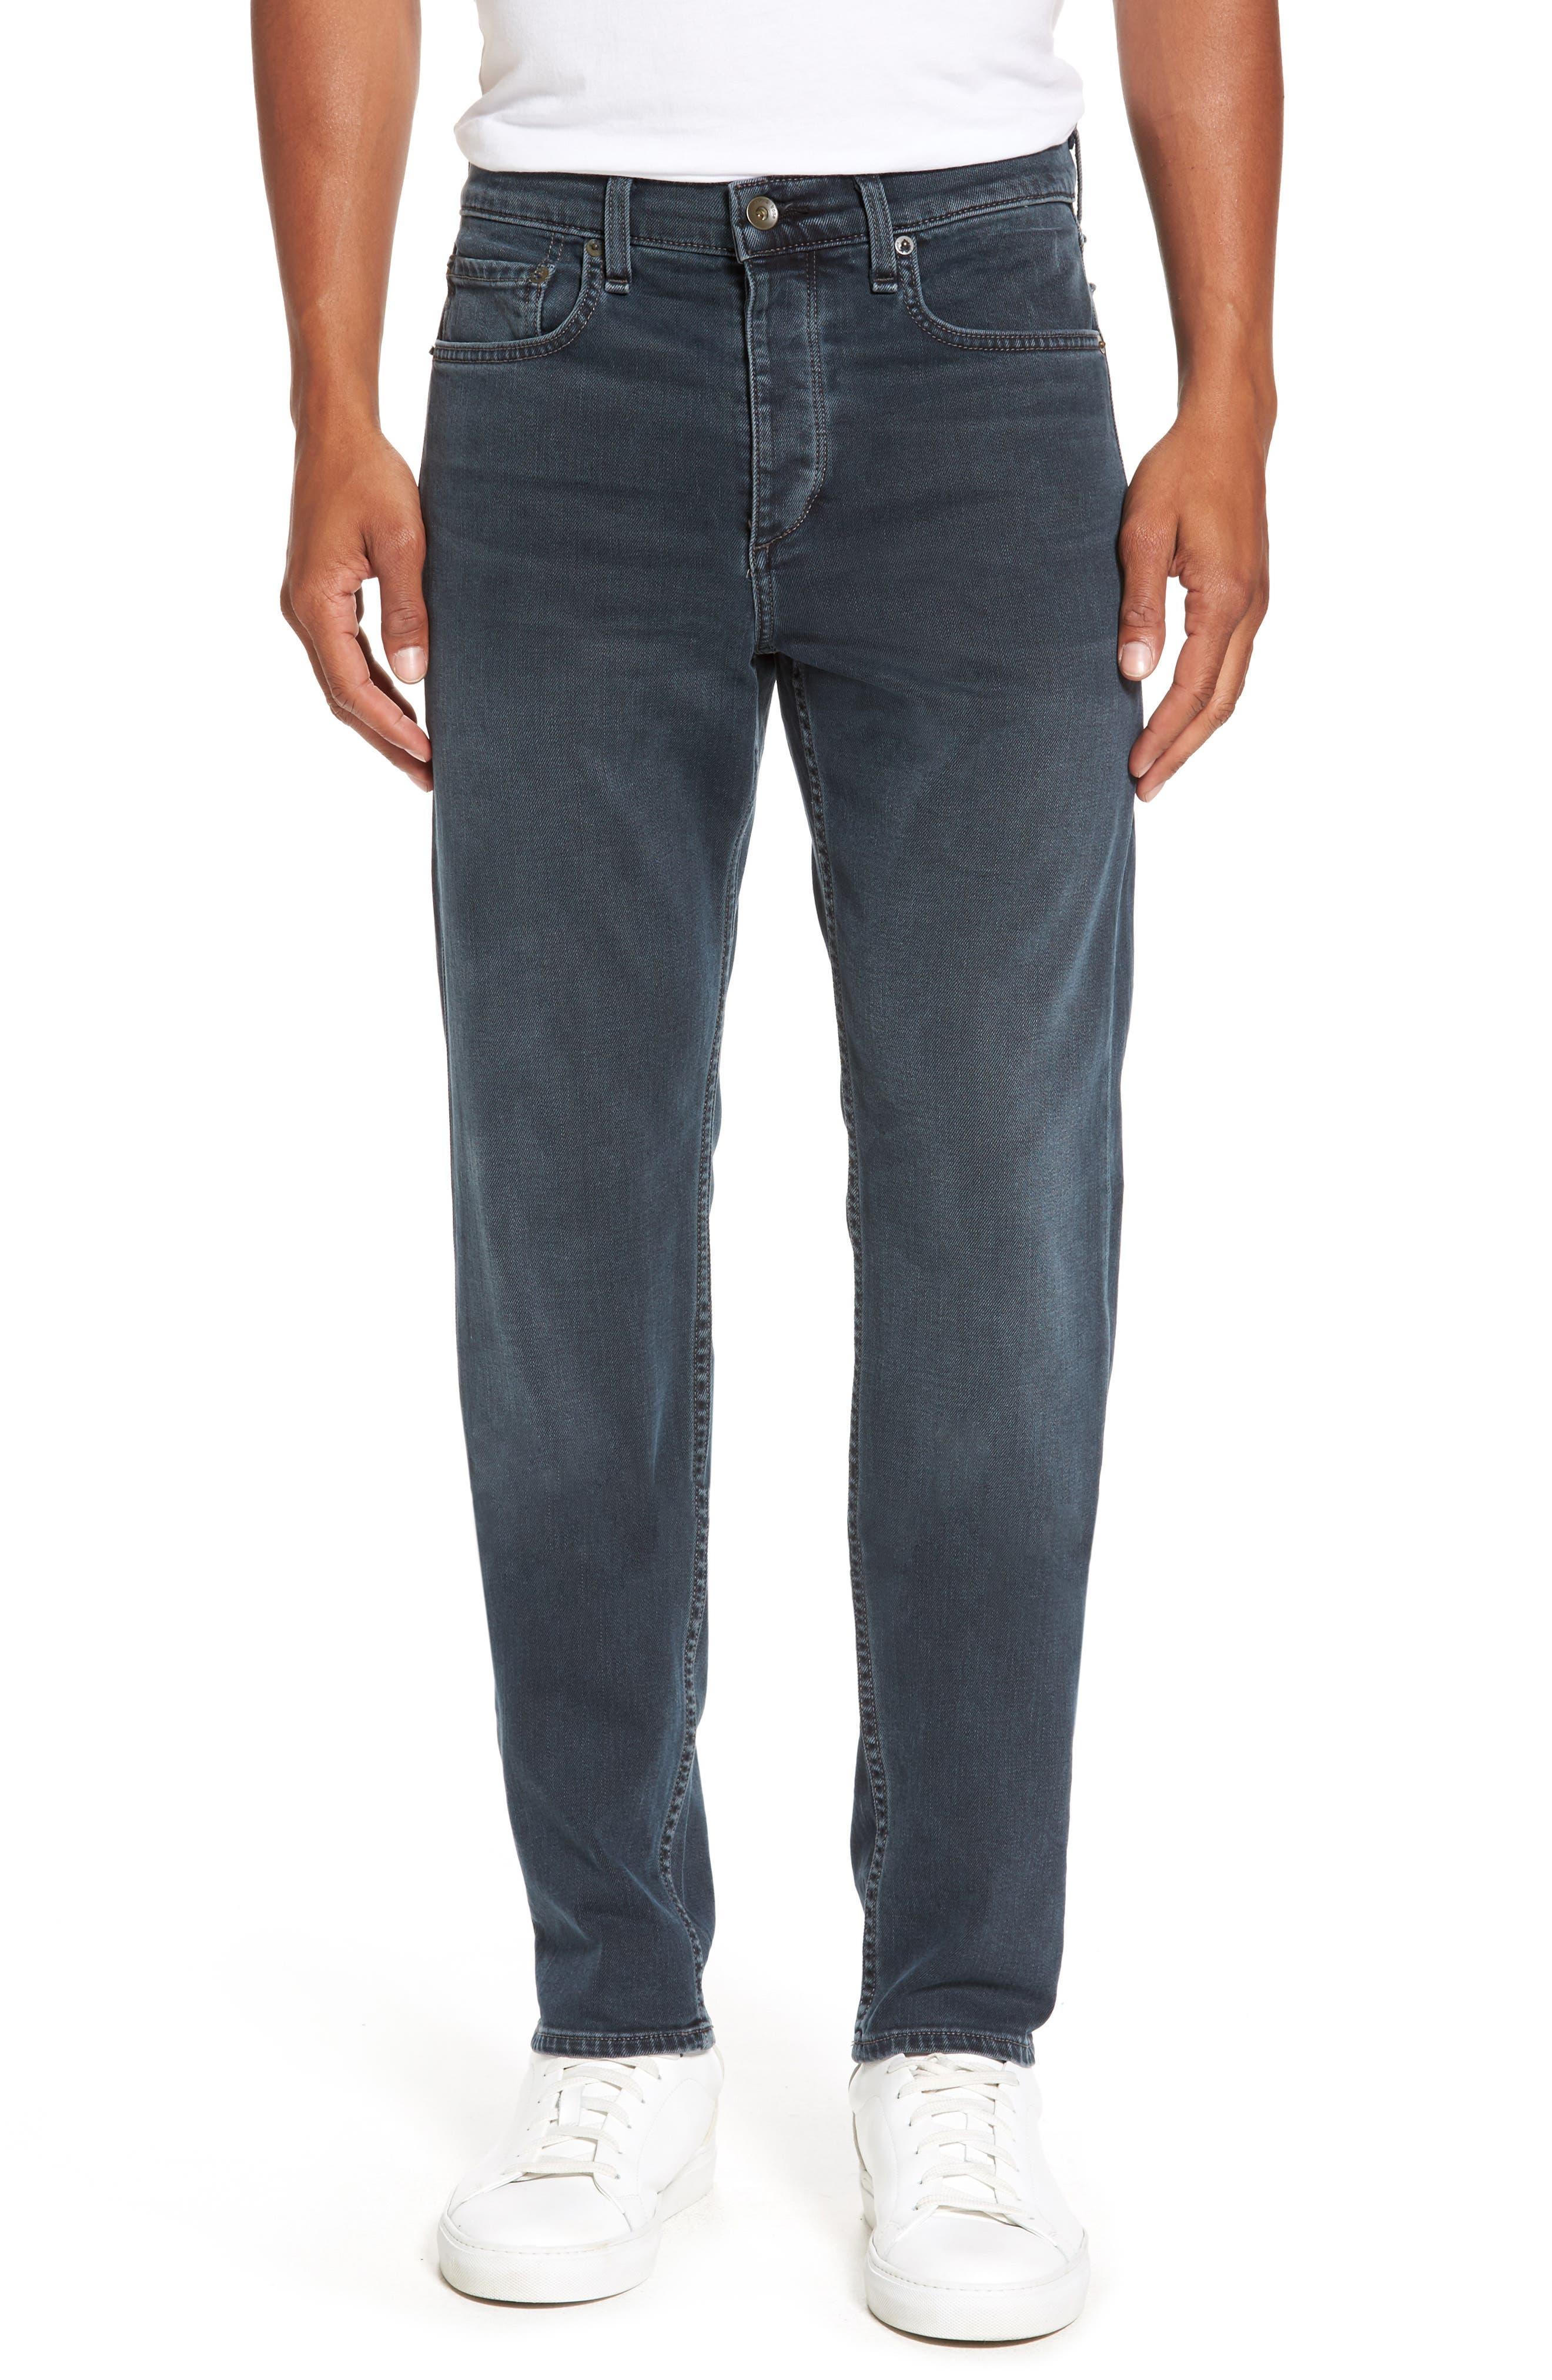 RAG & BONE, Fit 2 Slim Fit Jeans, Main thumbnail 1, color, MINNA